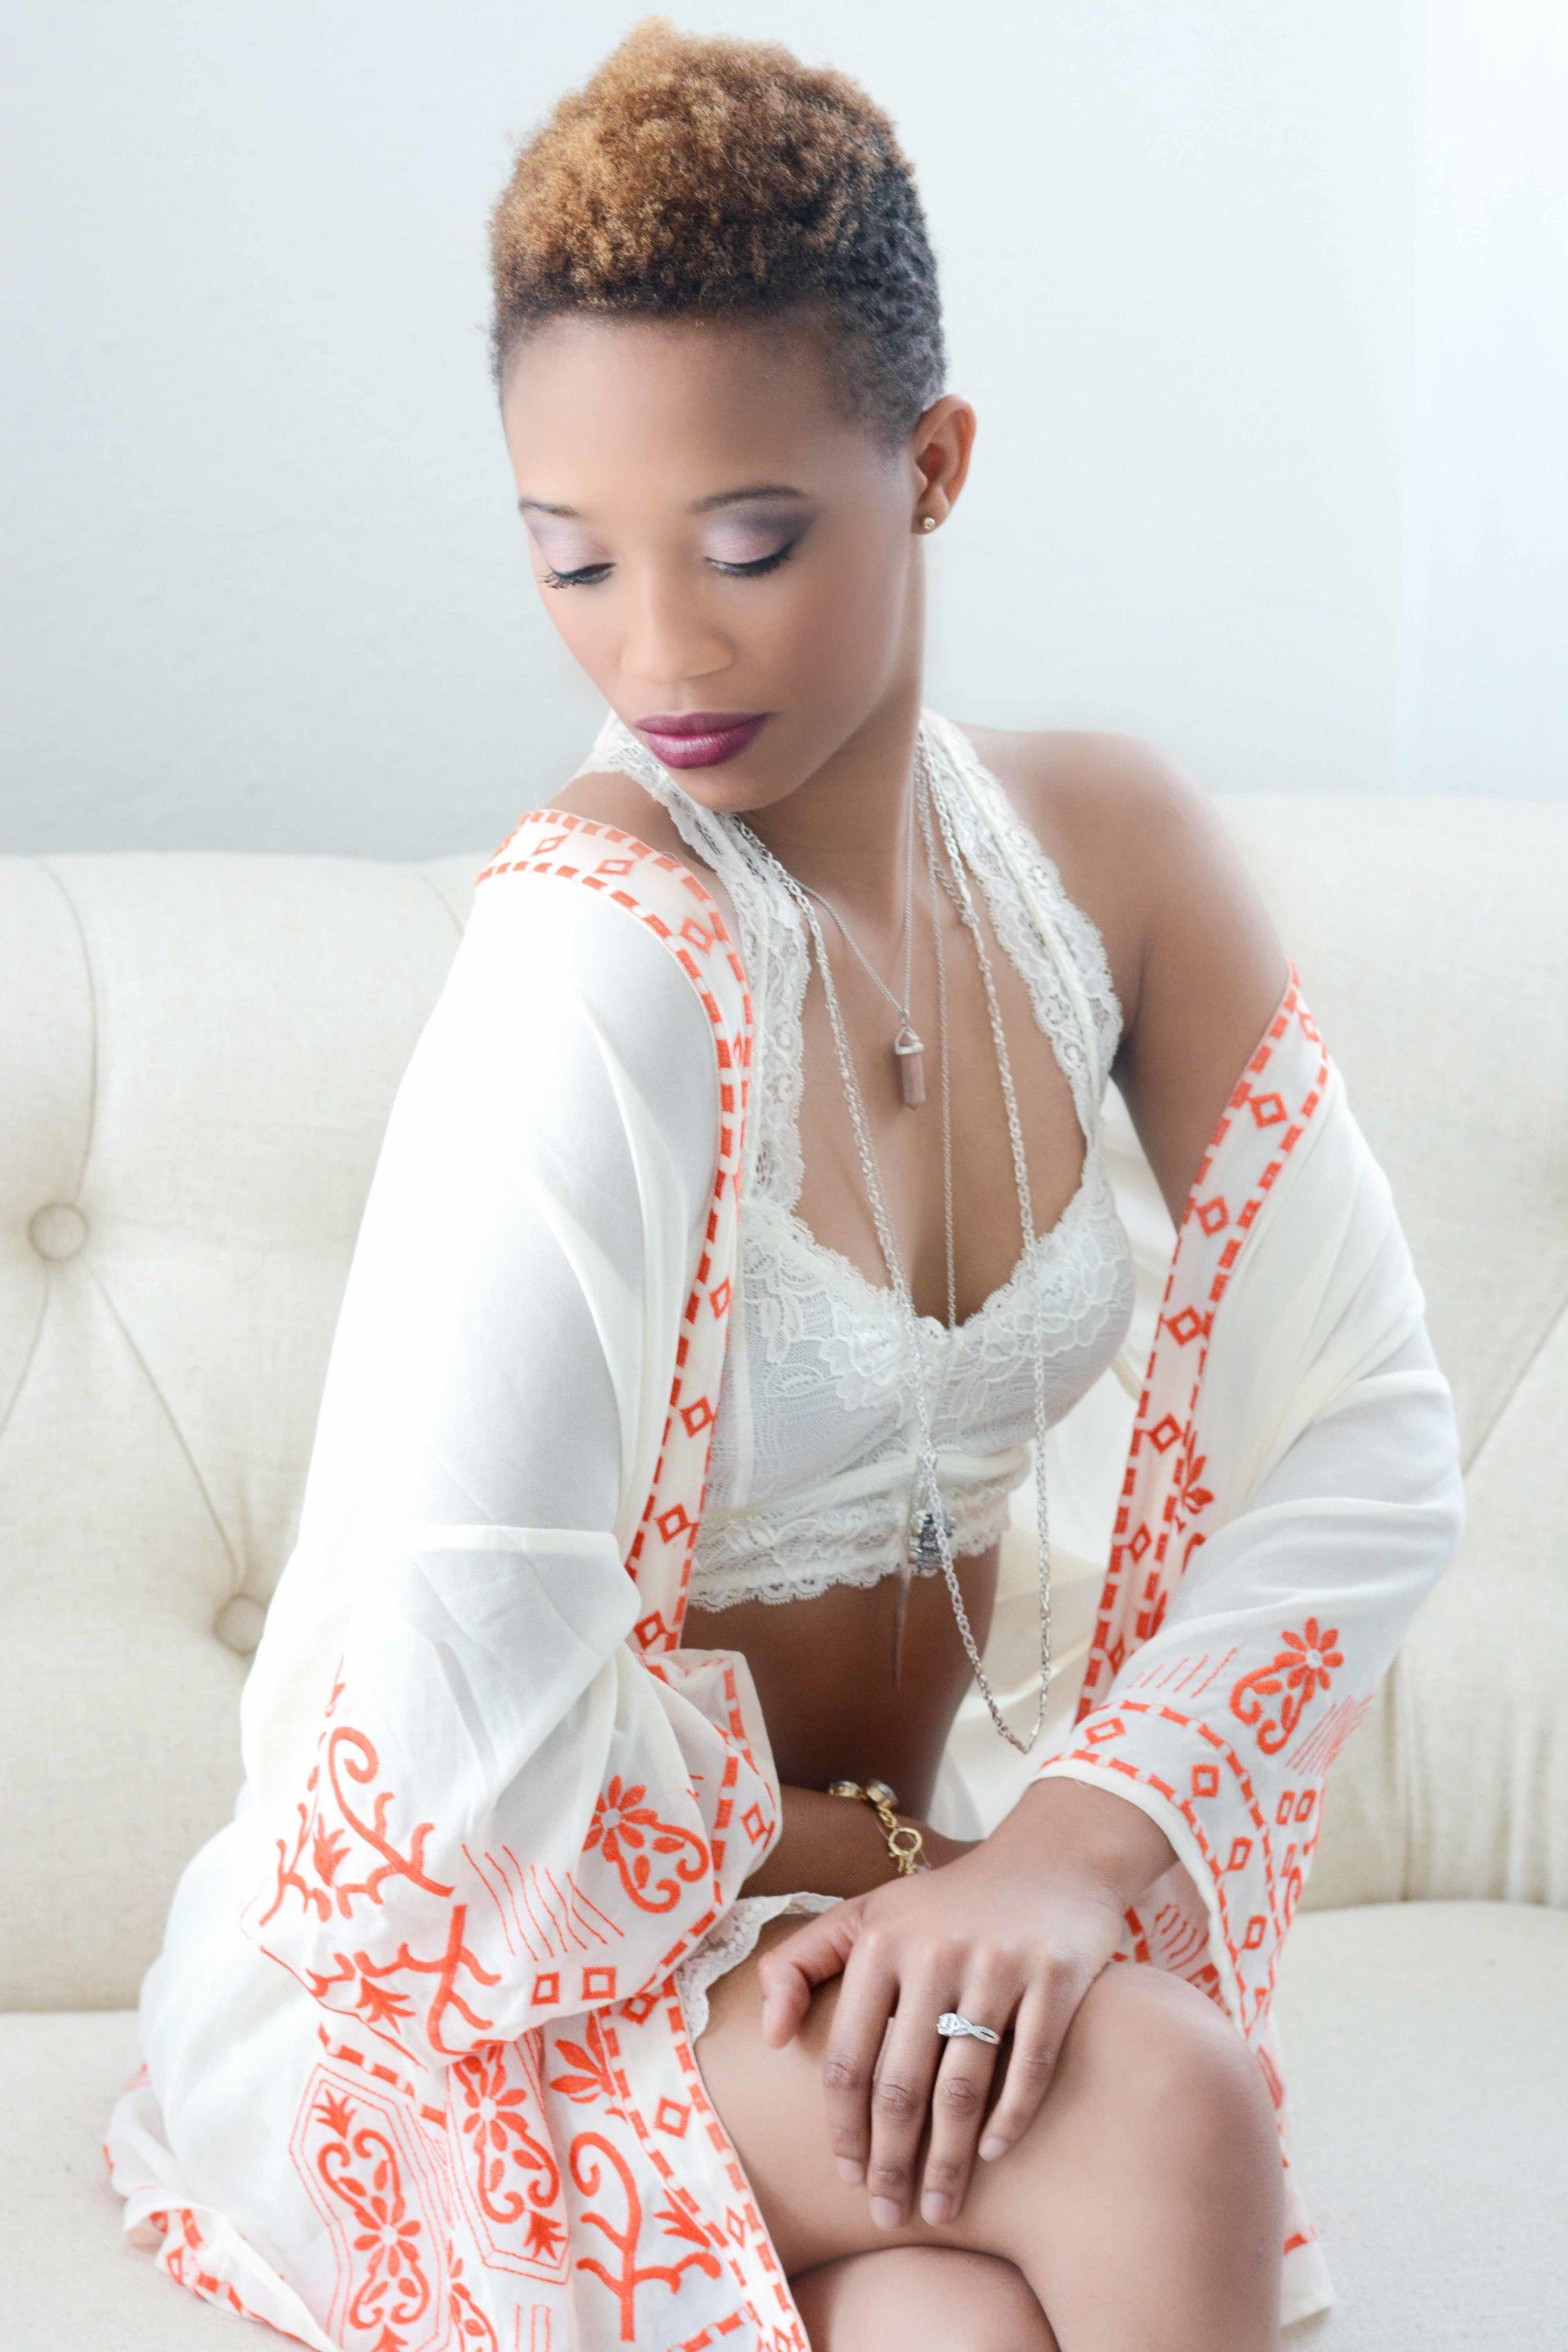 How to showoff your regal beauty in a boudoir session.  Dallas Boudoir Photography.  Wonderland Boudoir